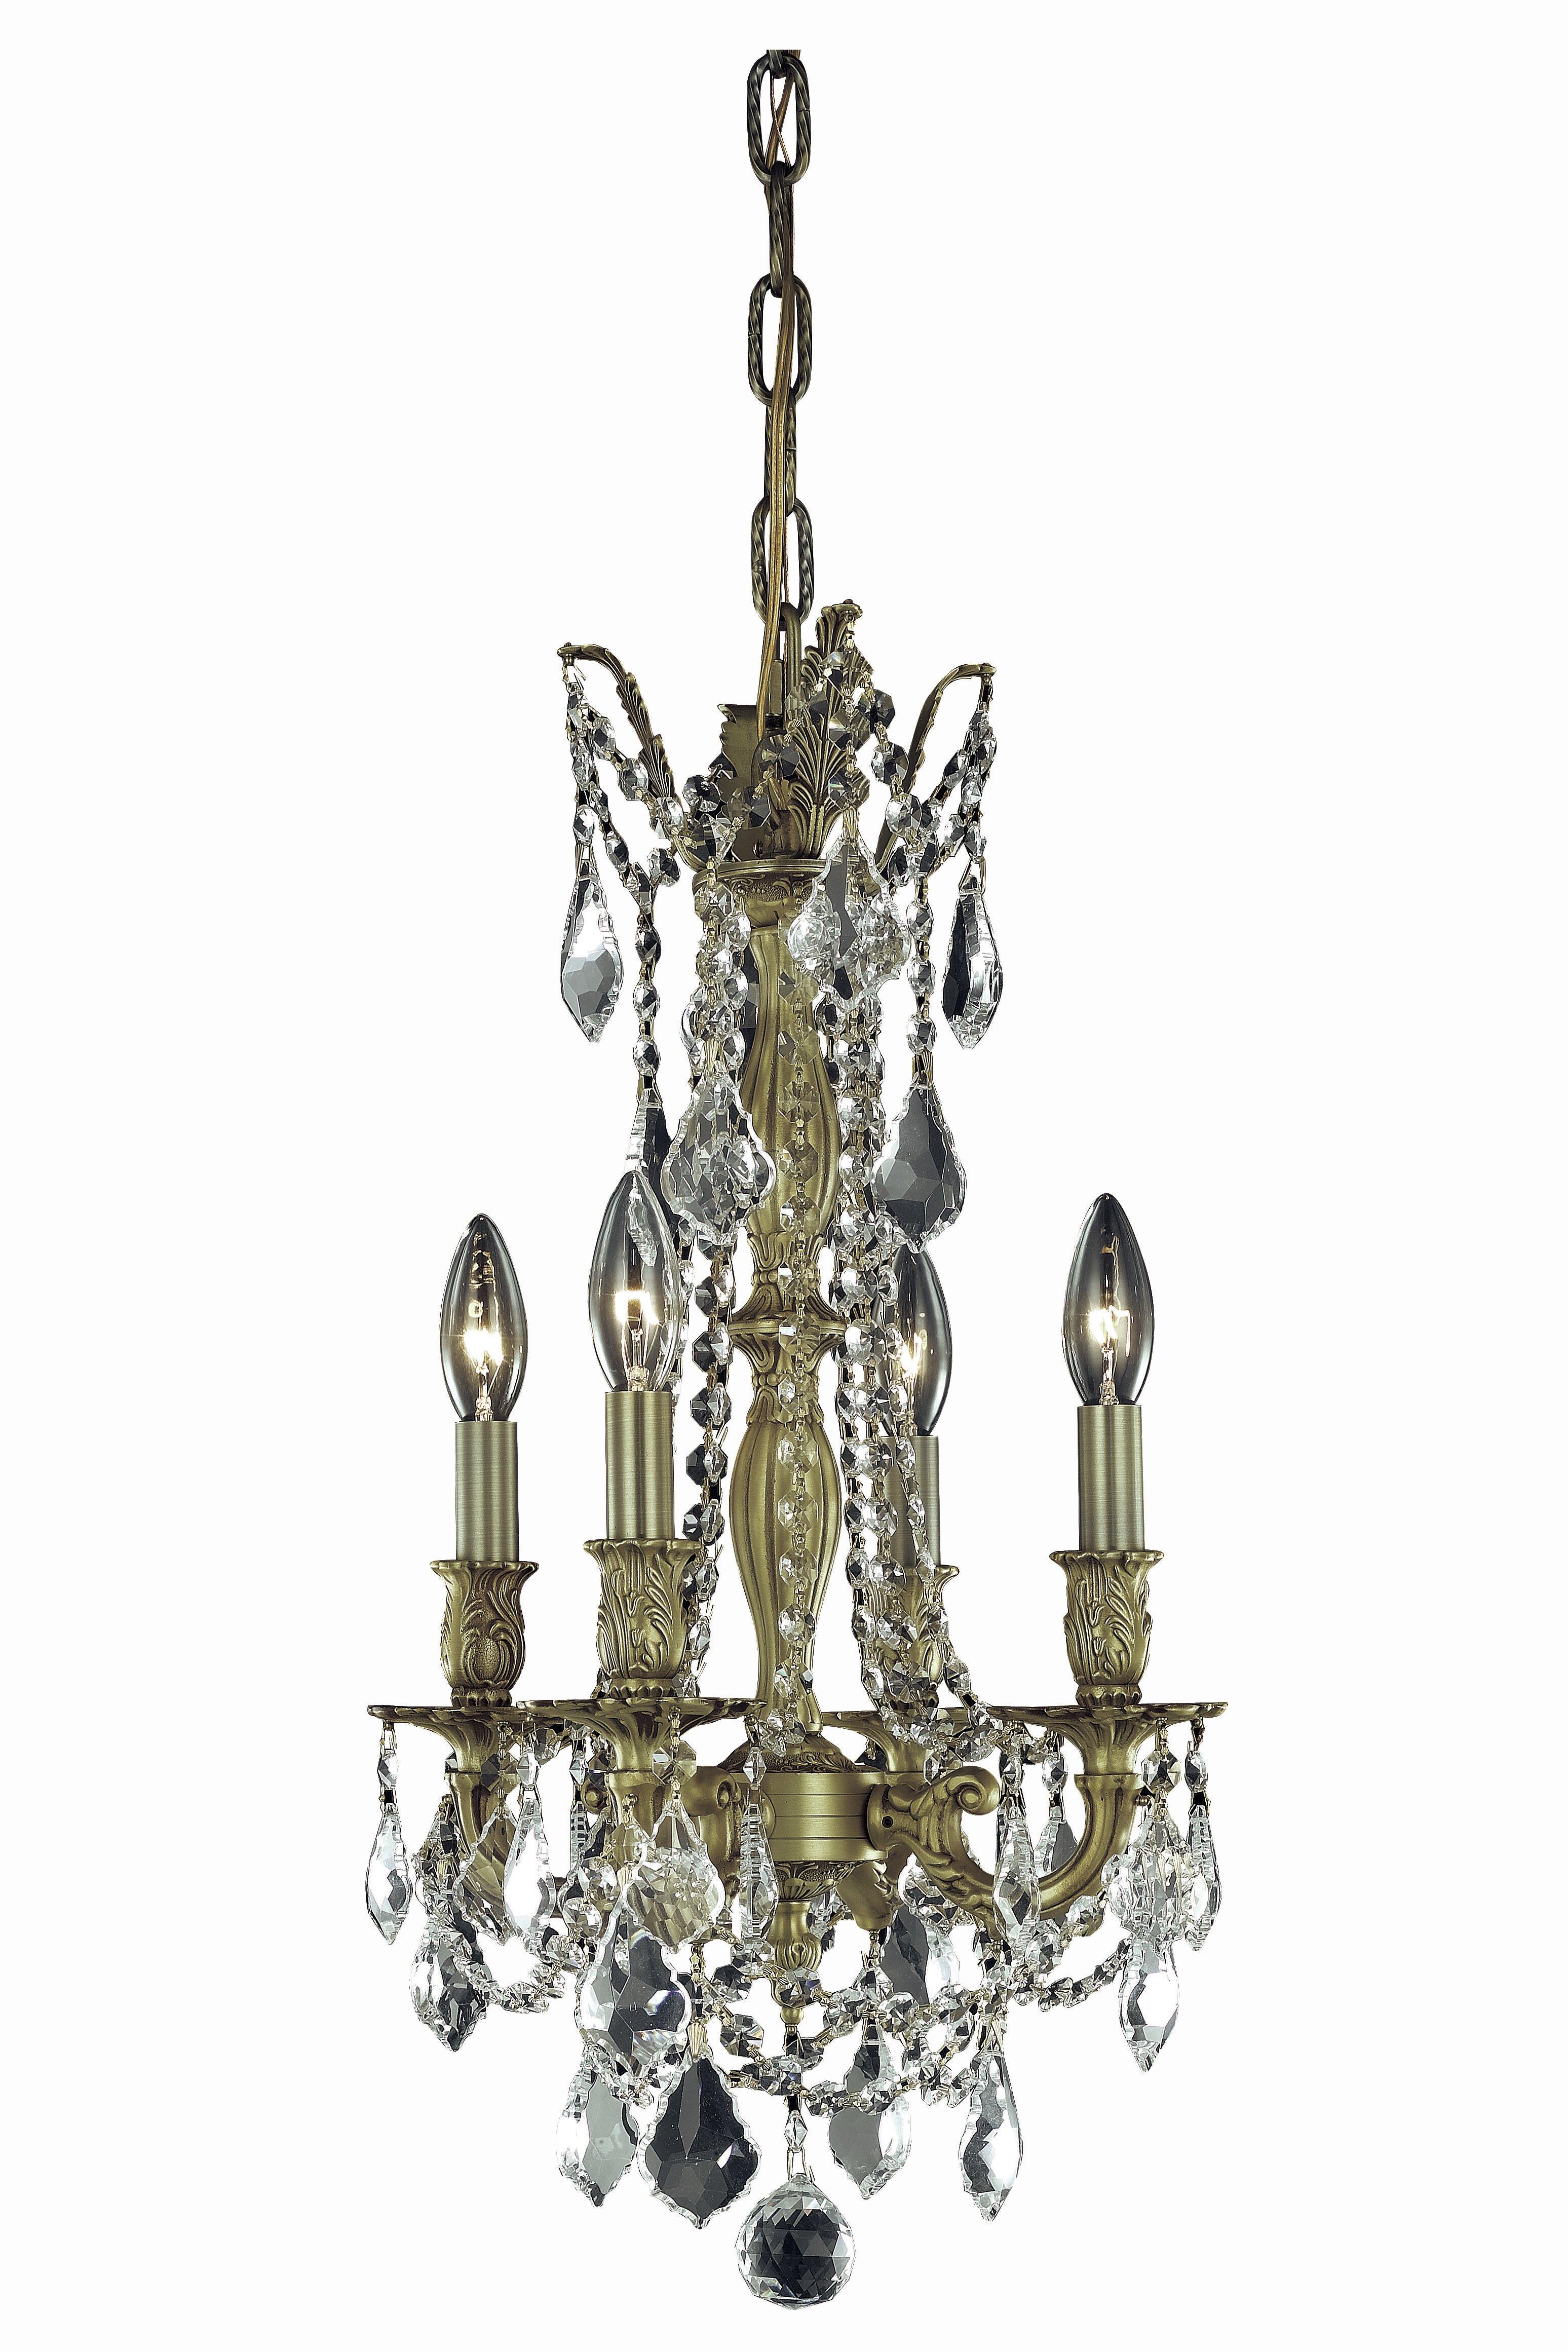 Astoria grand utica 4 light candle style chandelier wayfair